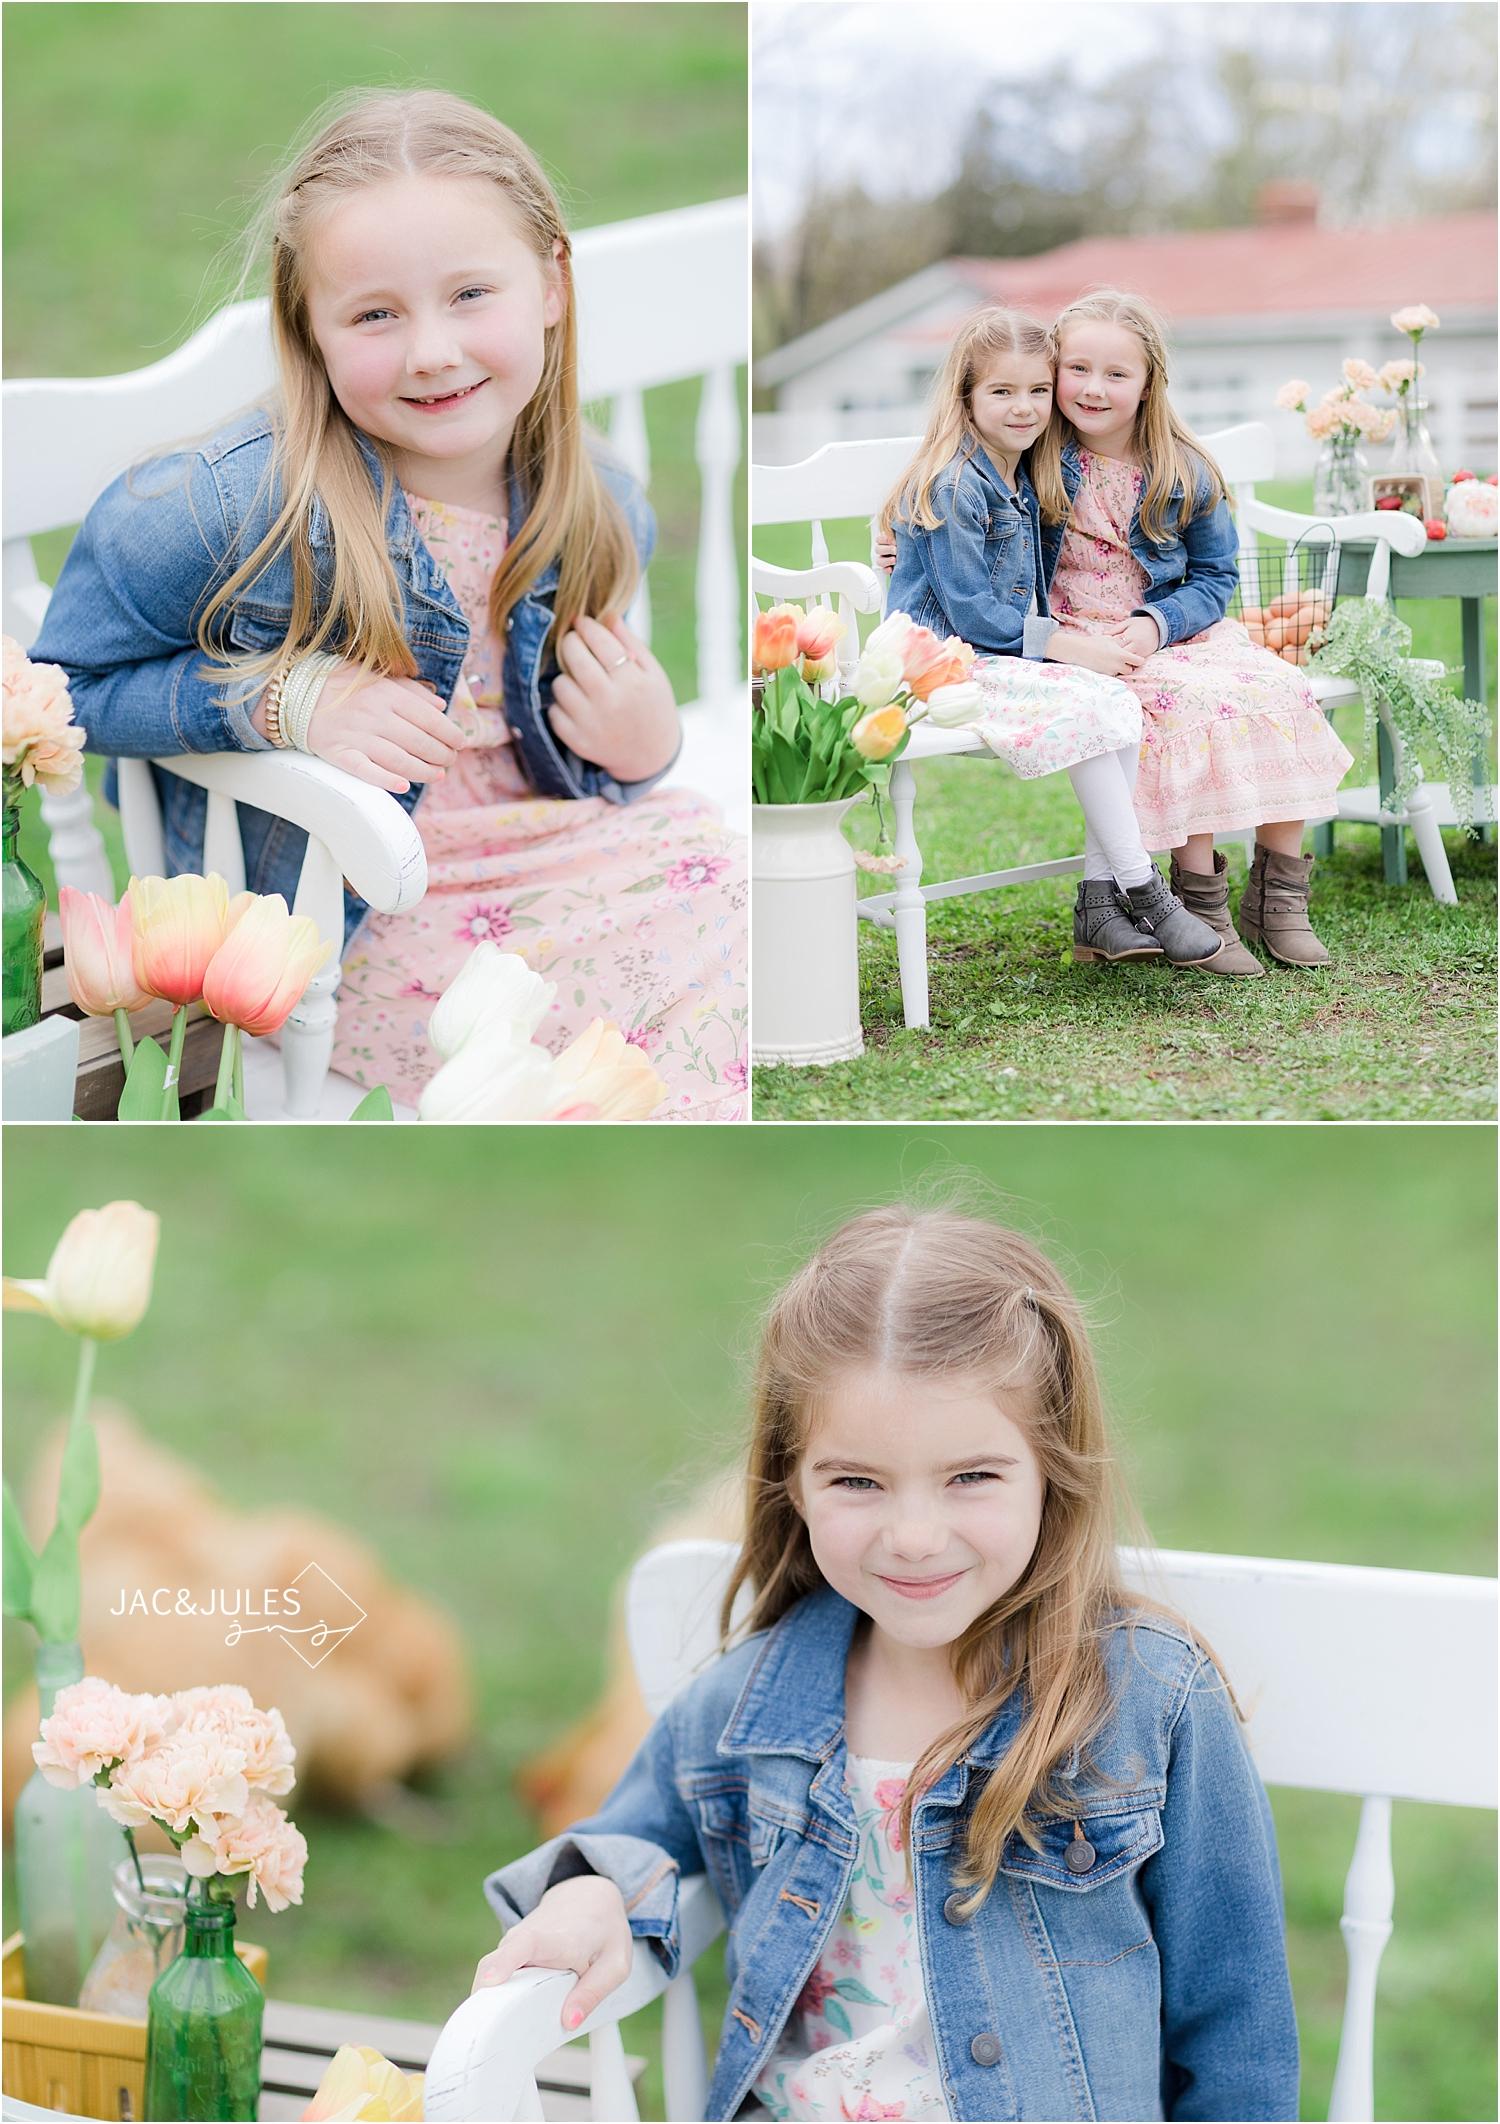 photos of girls at a farm in cream ridge nj